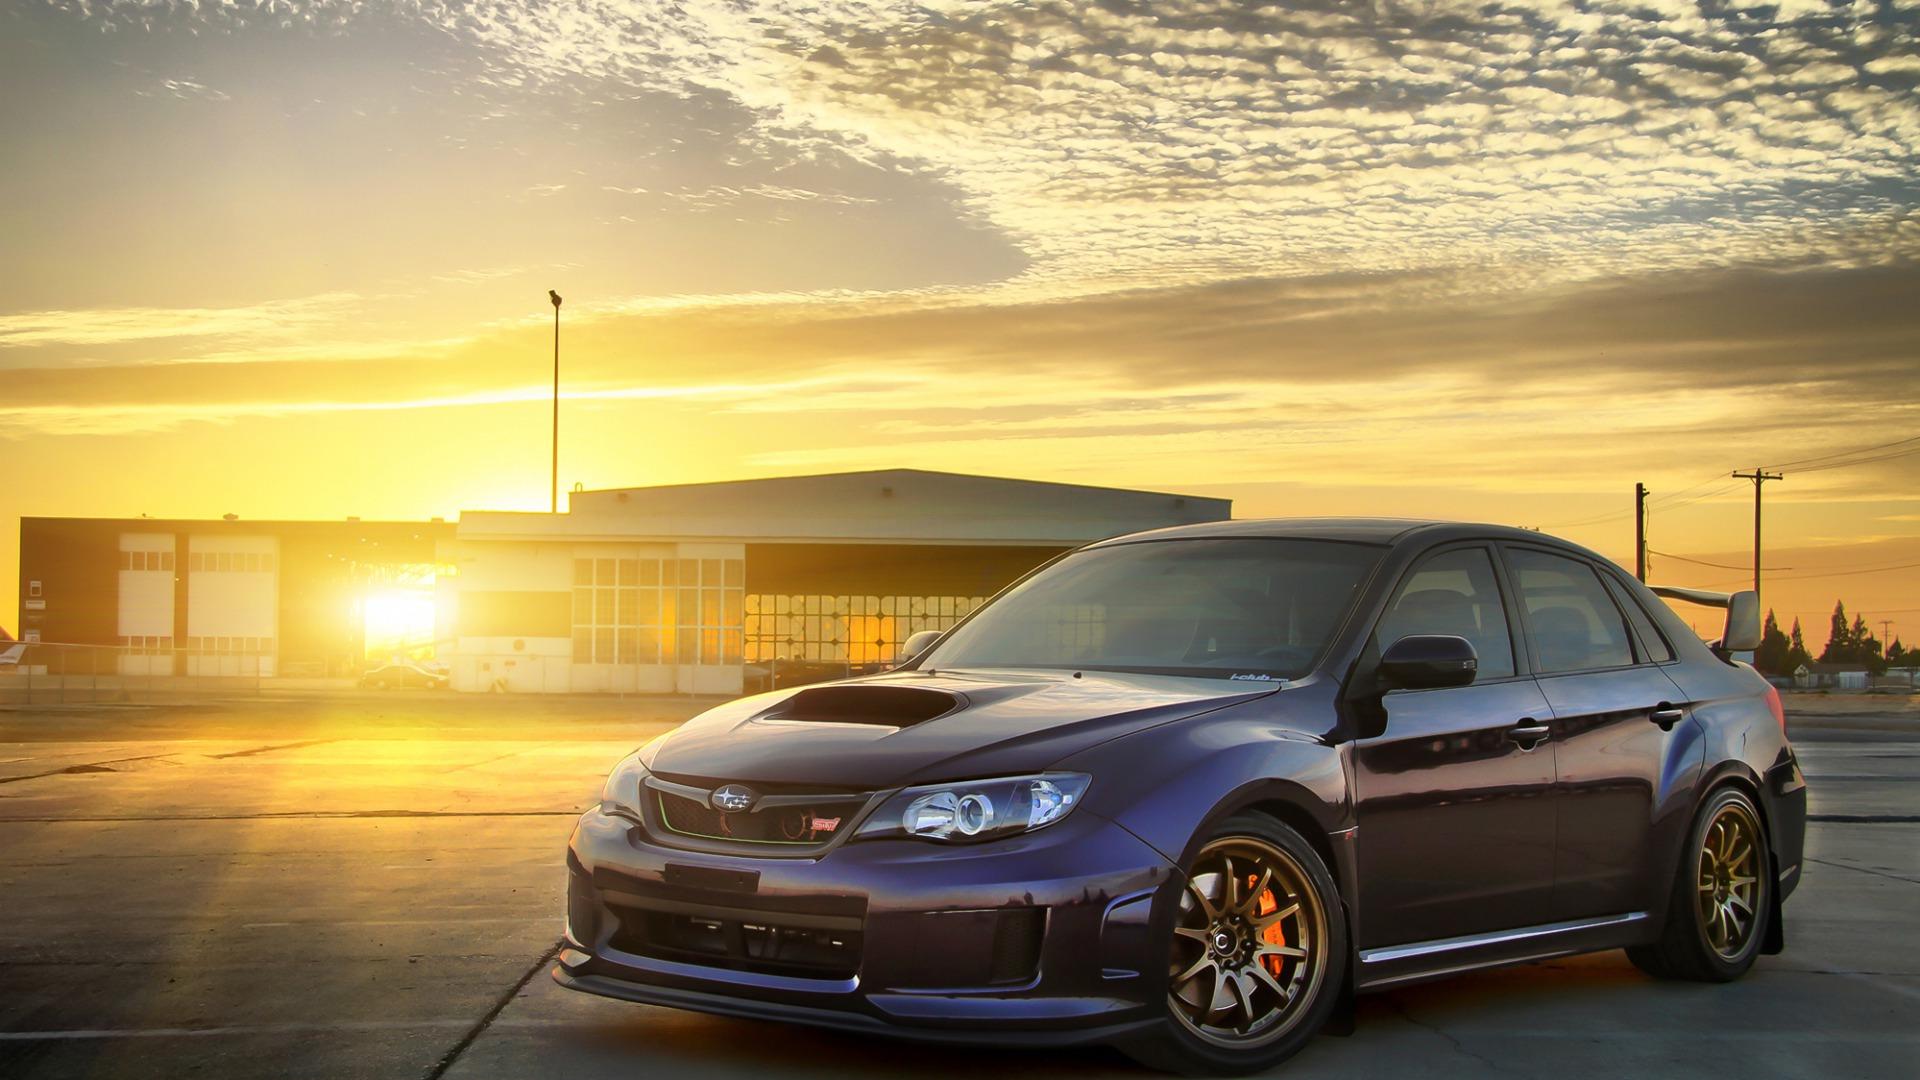 Car Subaru Impreza At Sunrise Wallpapers And Images